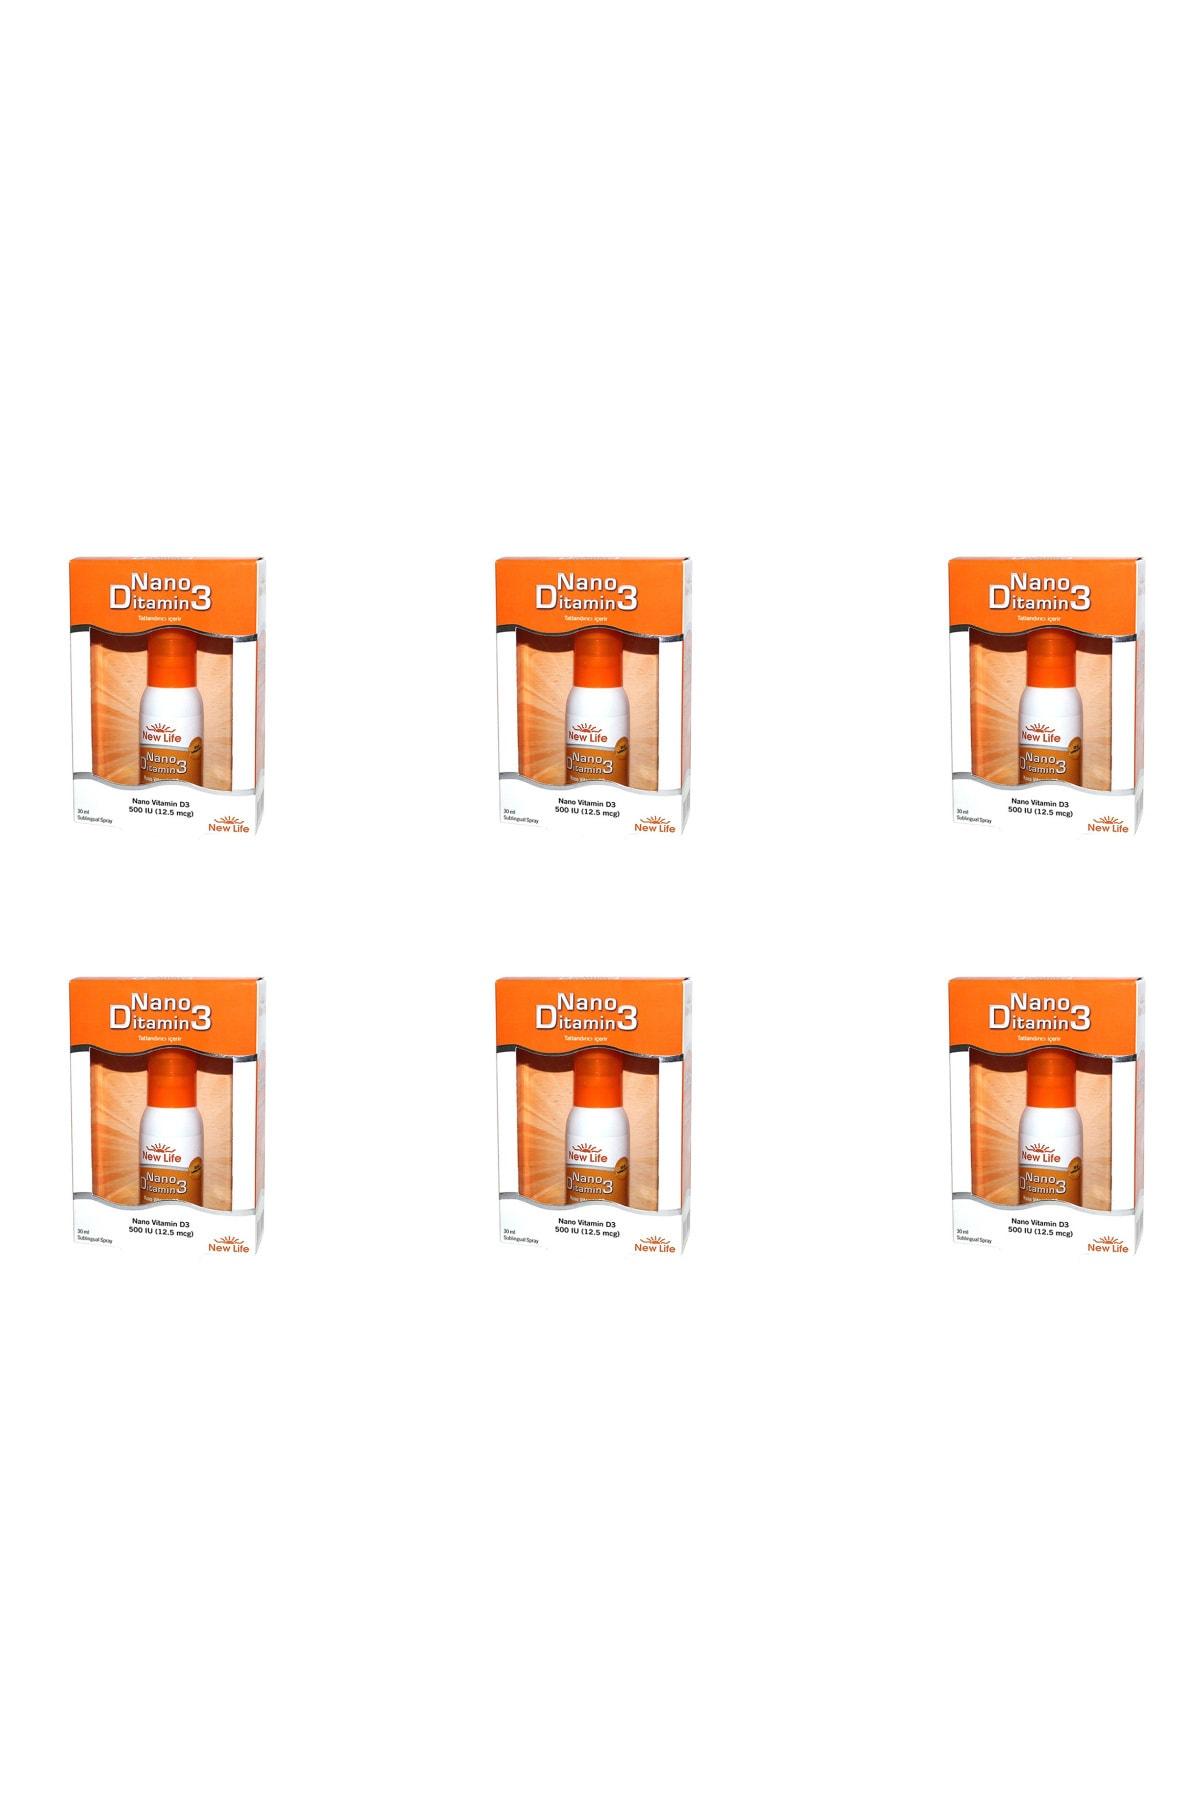 New Life Nano Ditamin D3 D Vitamini 30 Ml 6'lı Paket 1